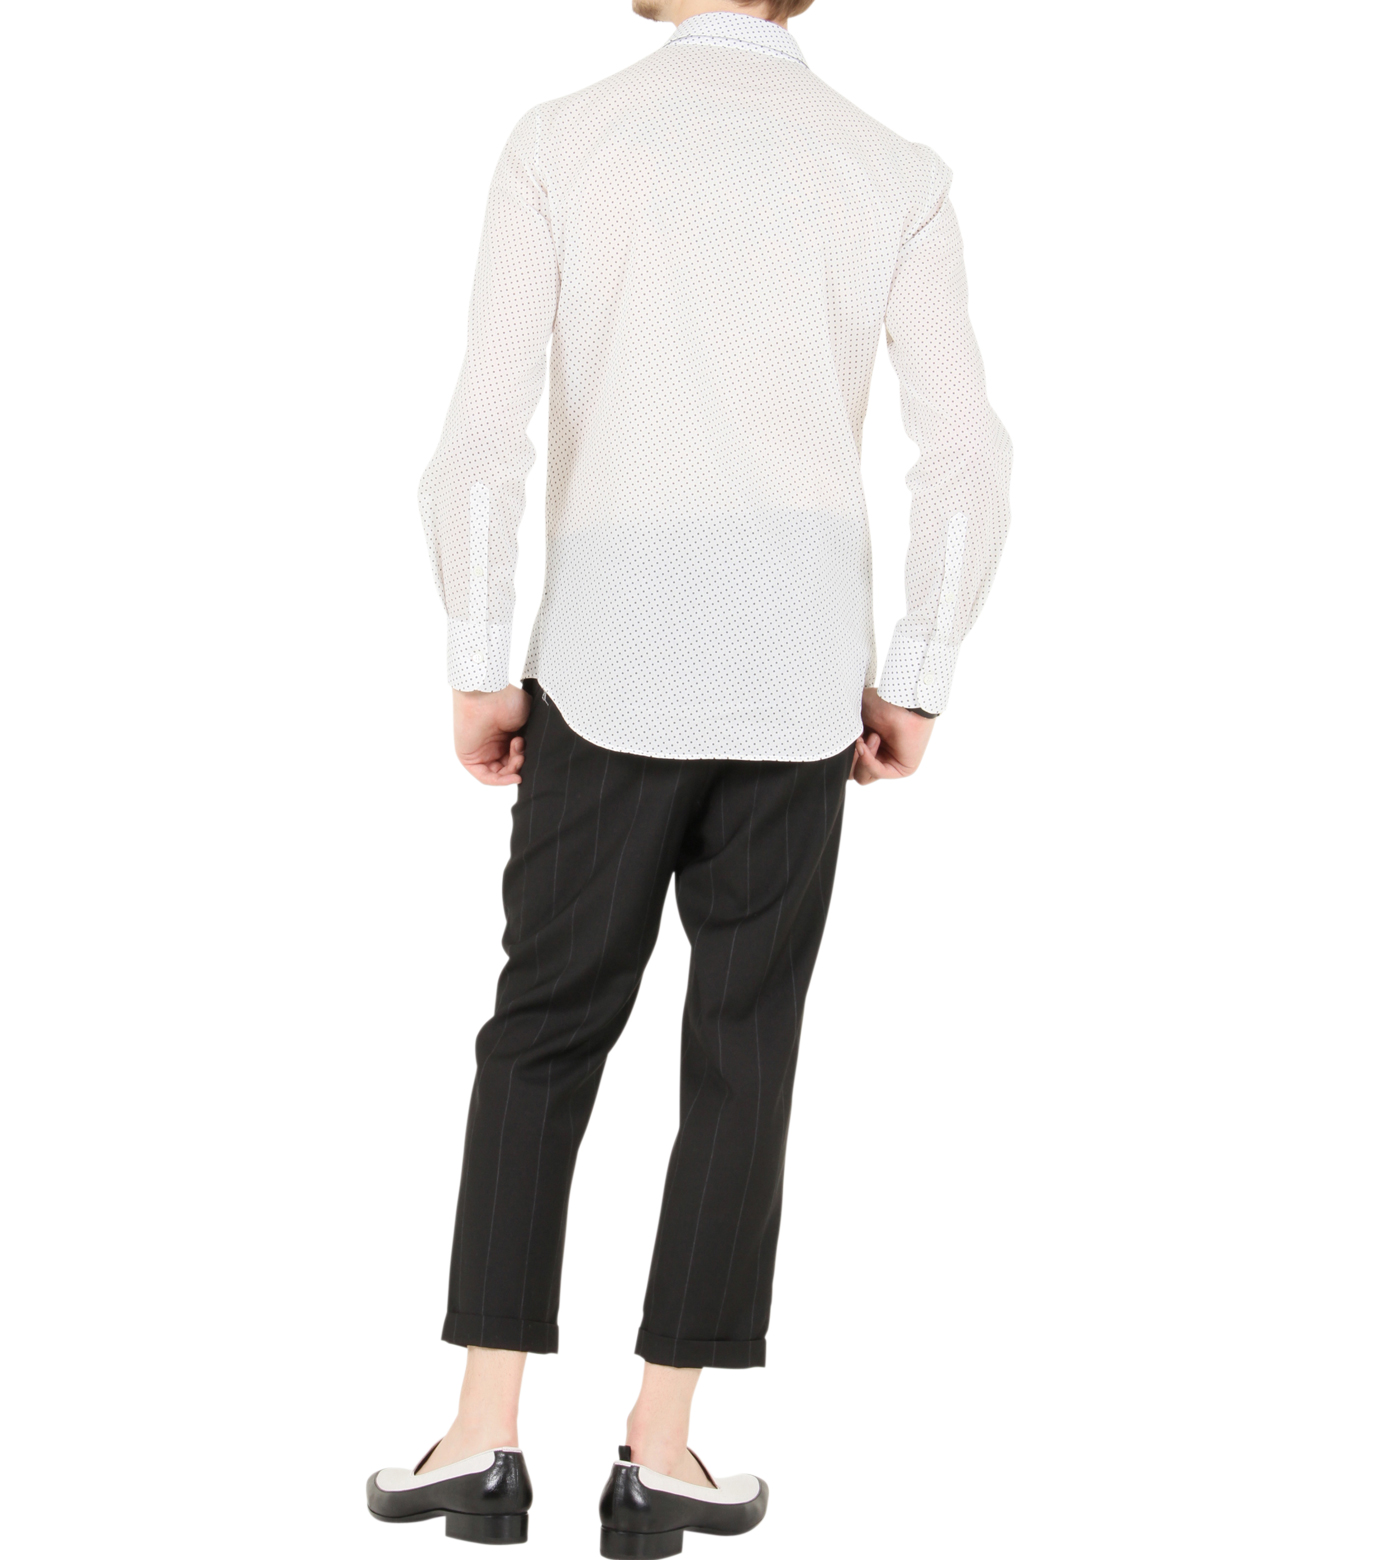 Alexander McQueen(アレキサンダーマックイーン)のSkul dots shirt-WHITE-283024-QW601-4 拡大詳細画像3